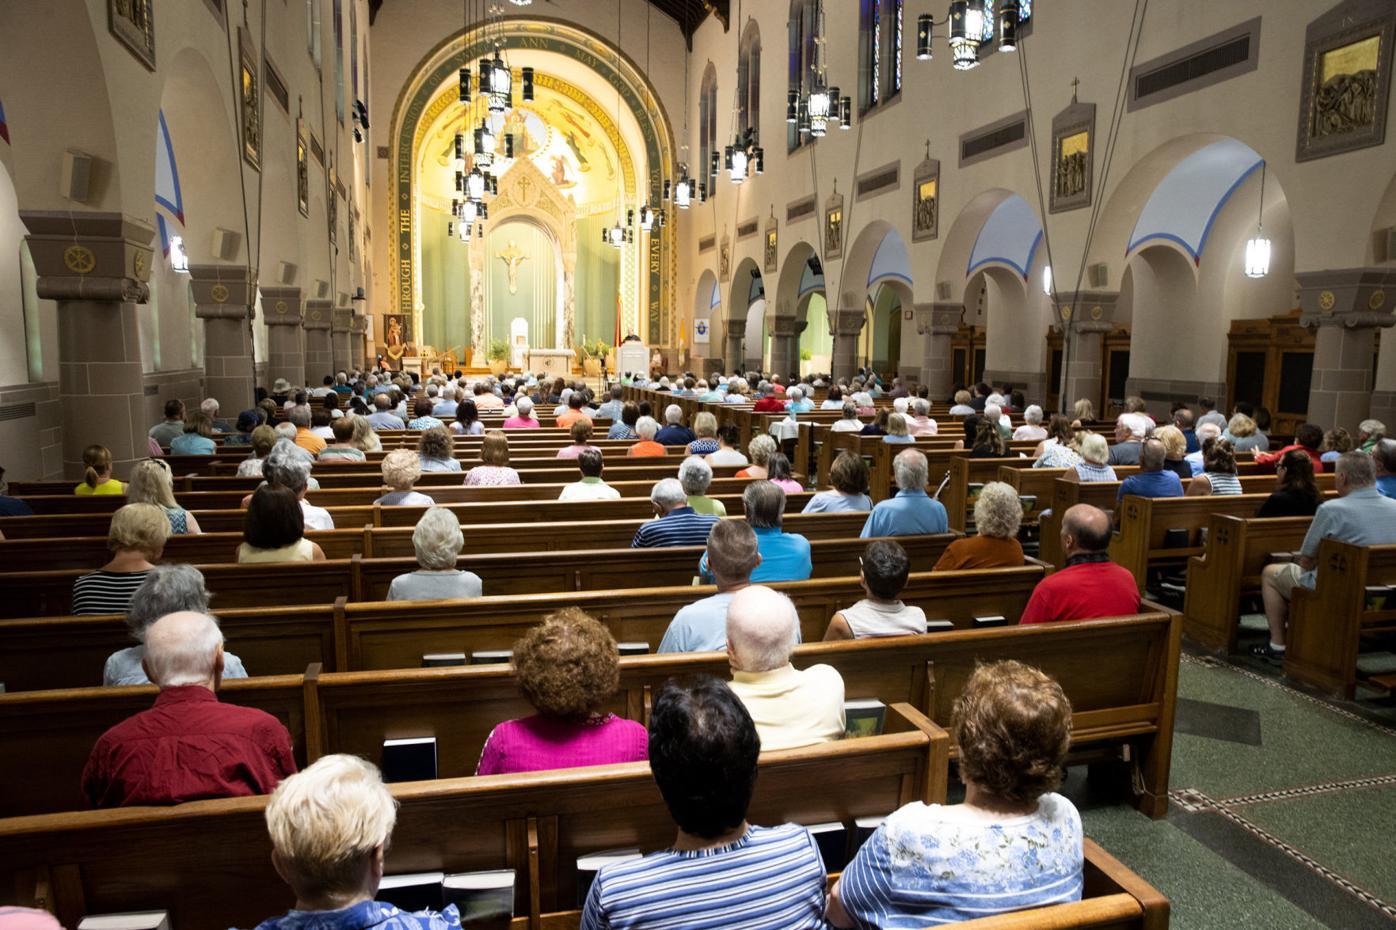 Annual Solemn Novena to St. Ann in Scranton